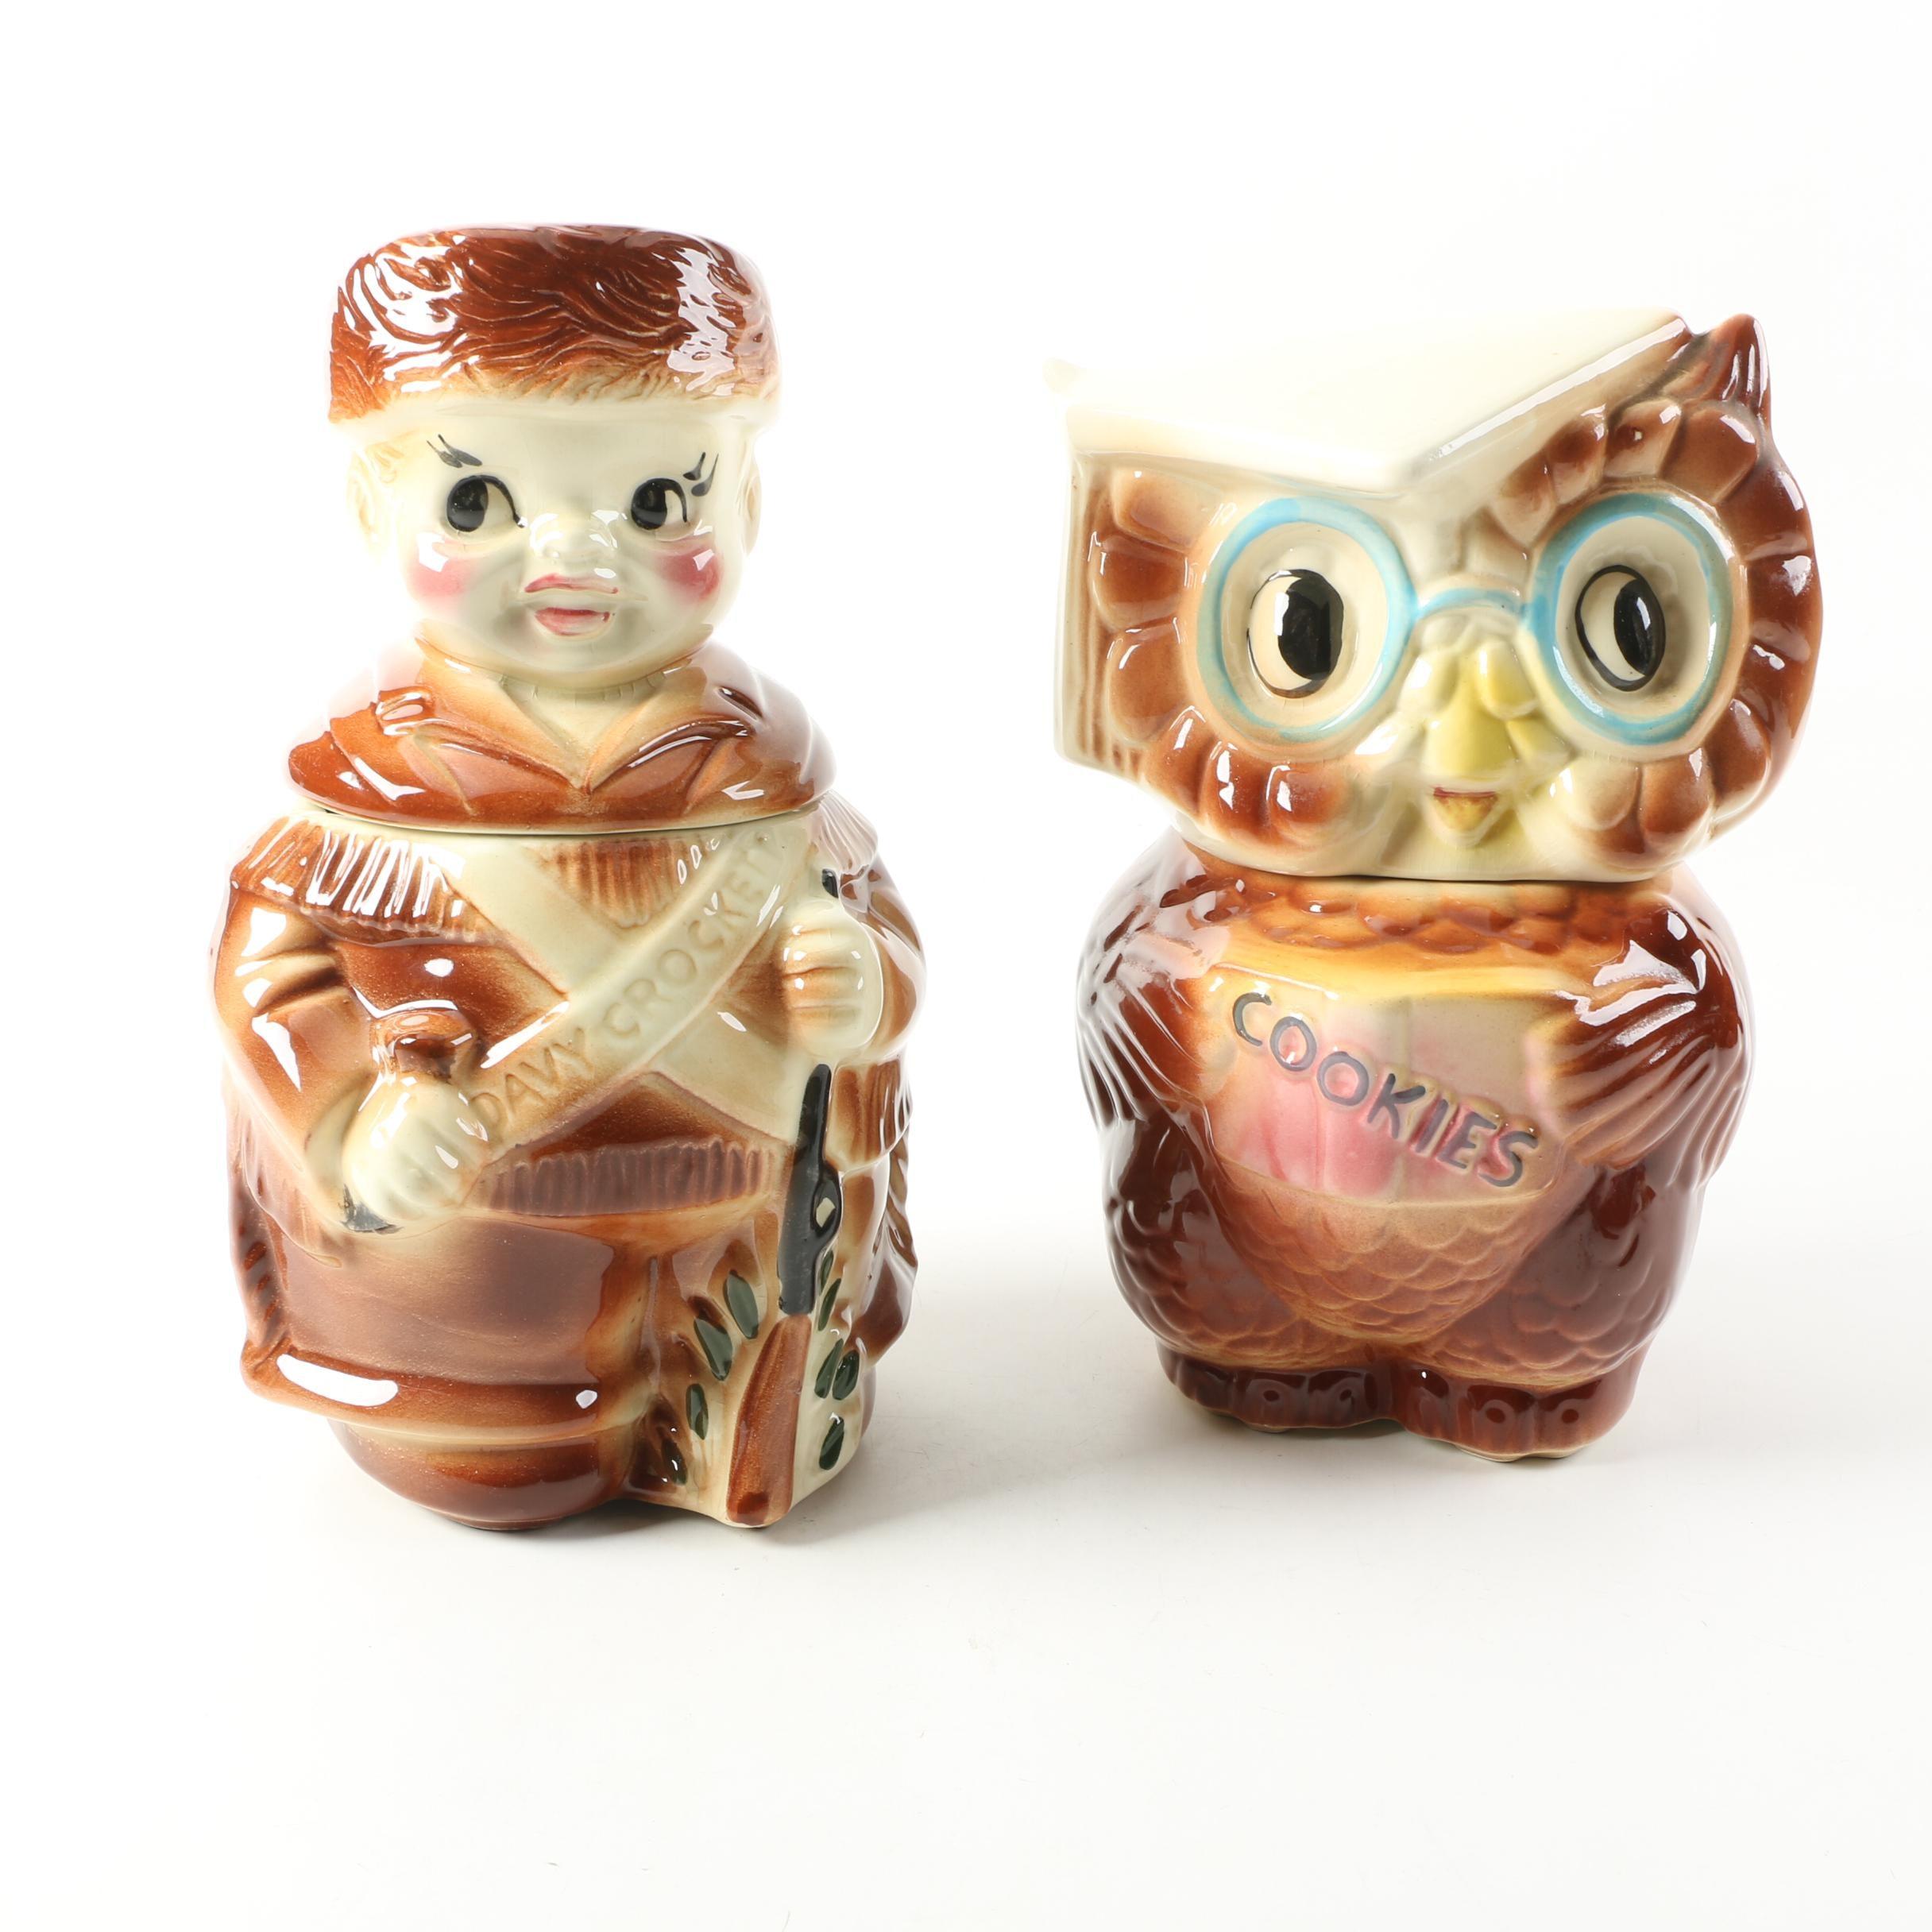 American Bisque Davy Crockett and Owl Ceramic Cookie Jars